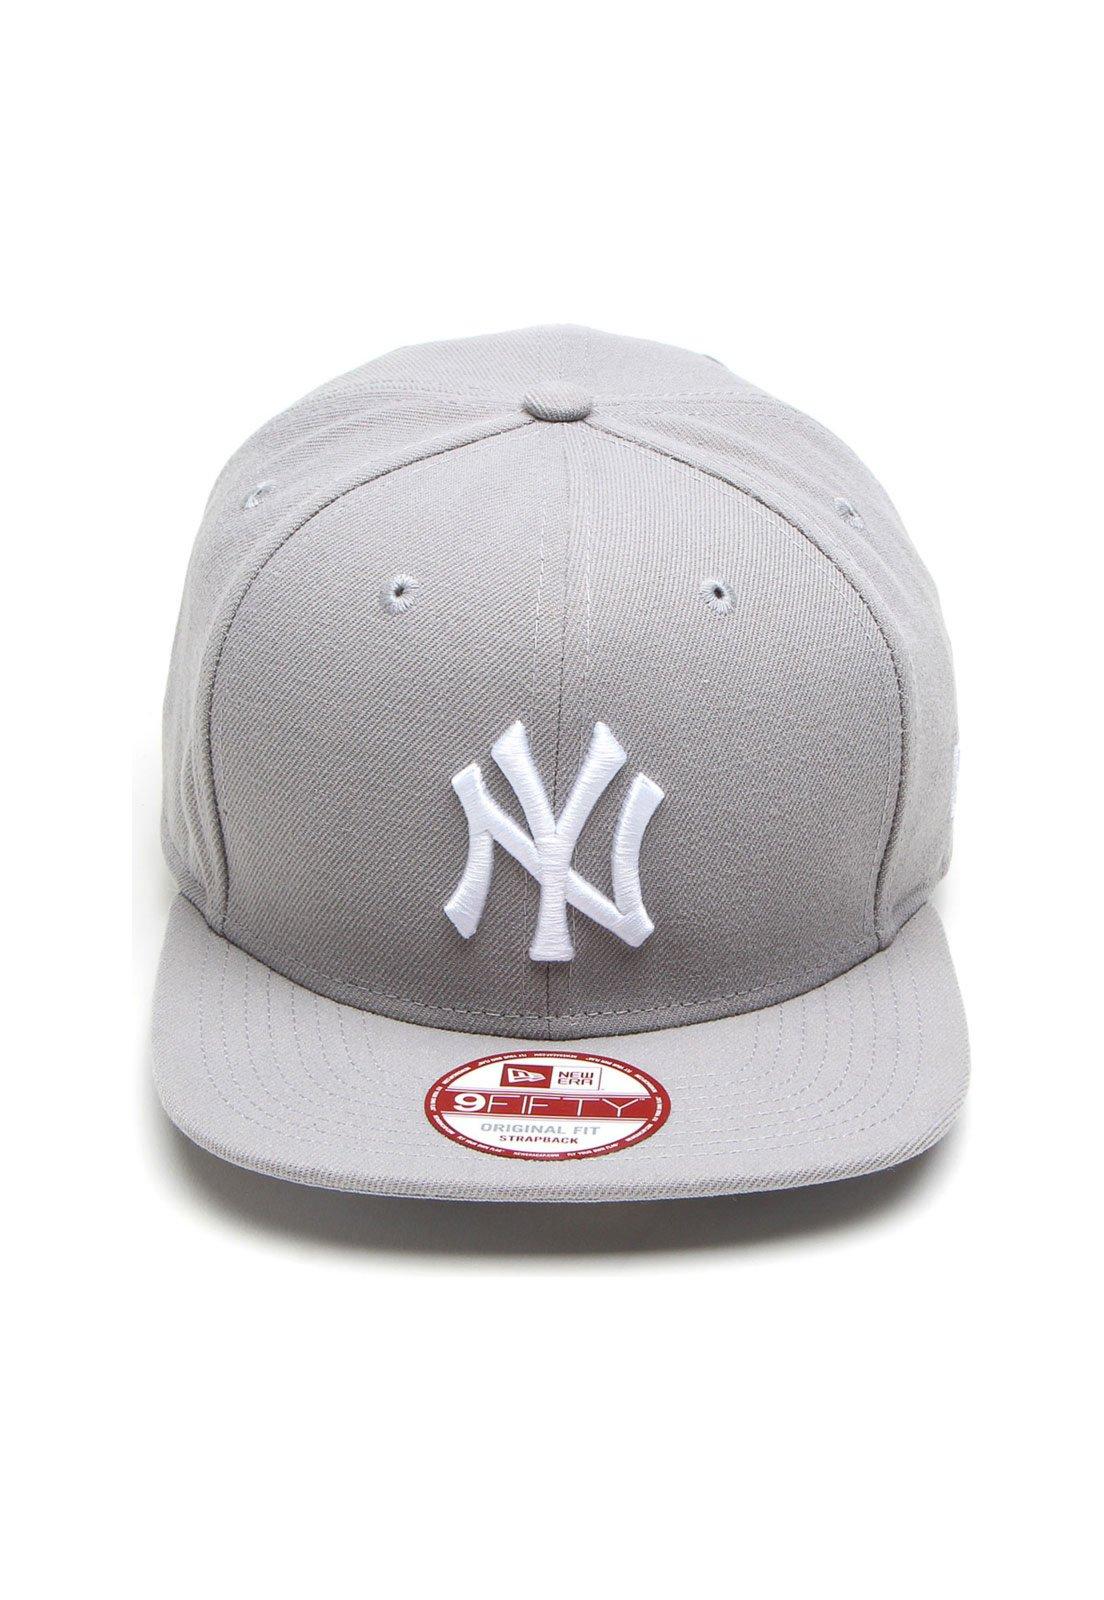 Boné New Era Strapback 950 OF ST New York Yankees Cinza - Compre Agora  738cbfeec50